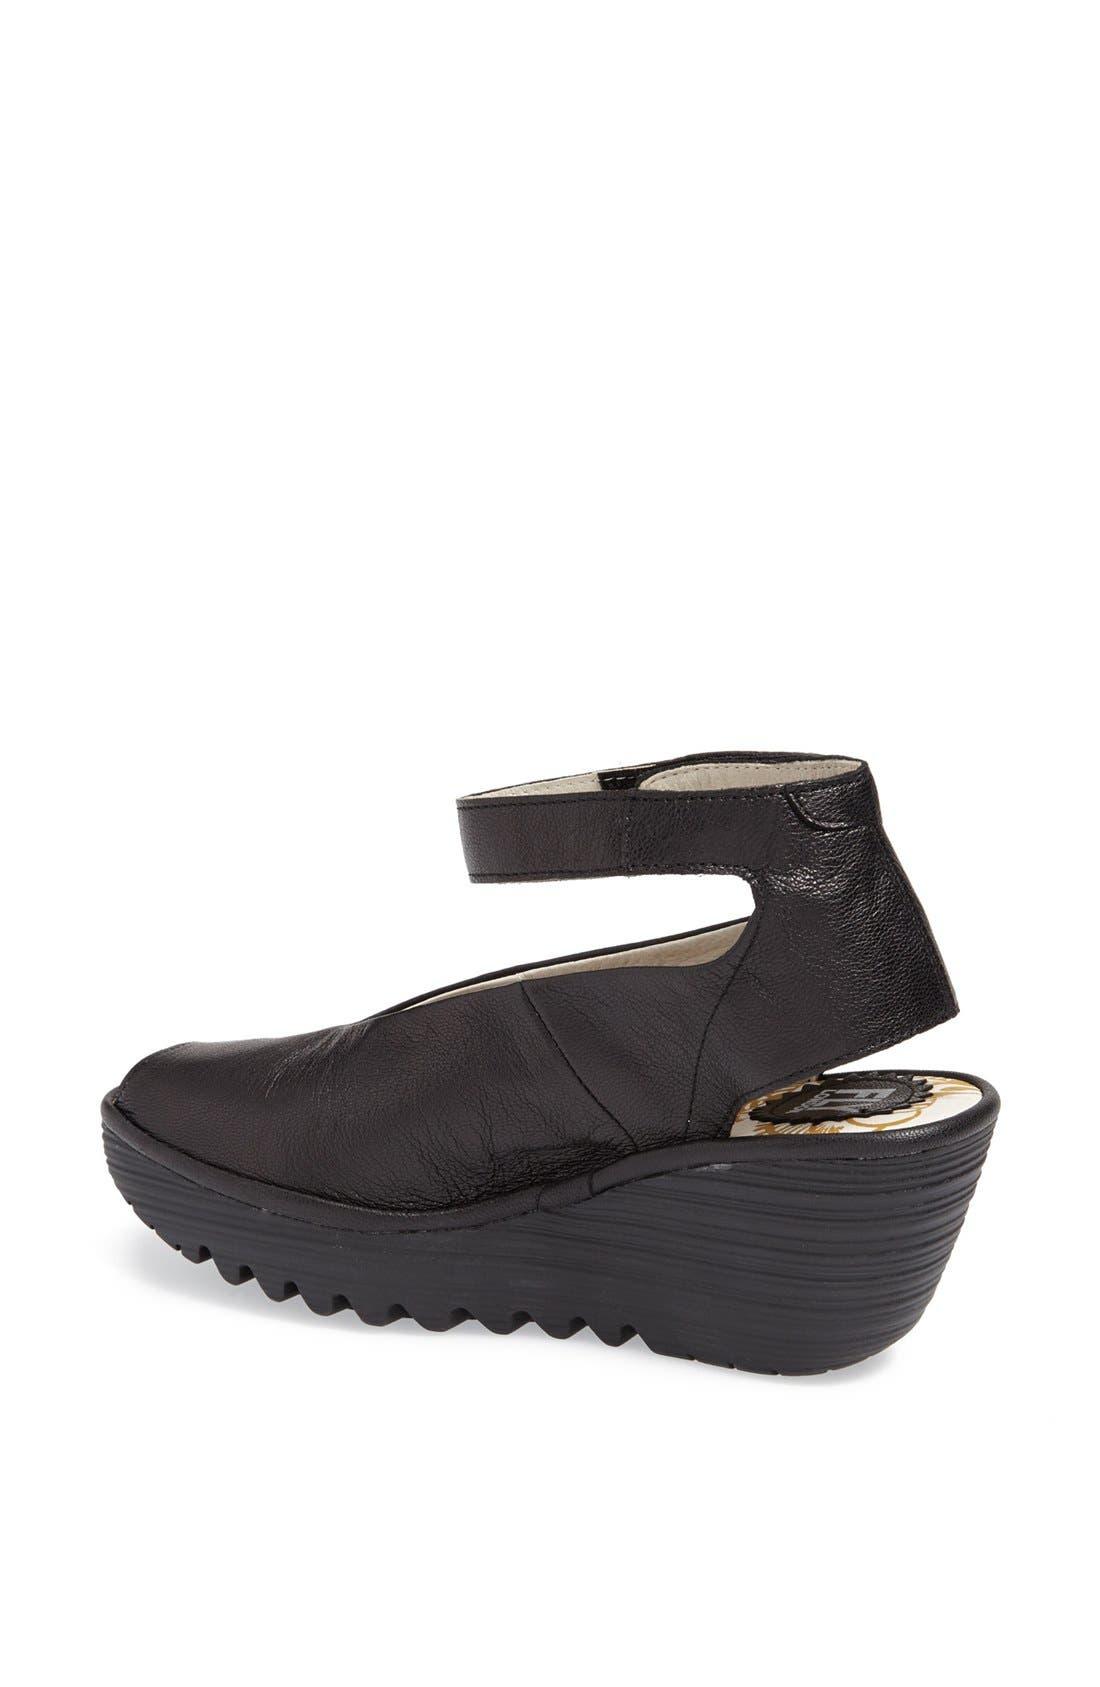 Alternate Image 2  - Fly London 'Yala' Sandal